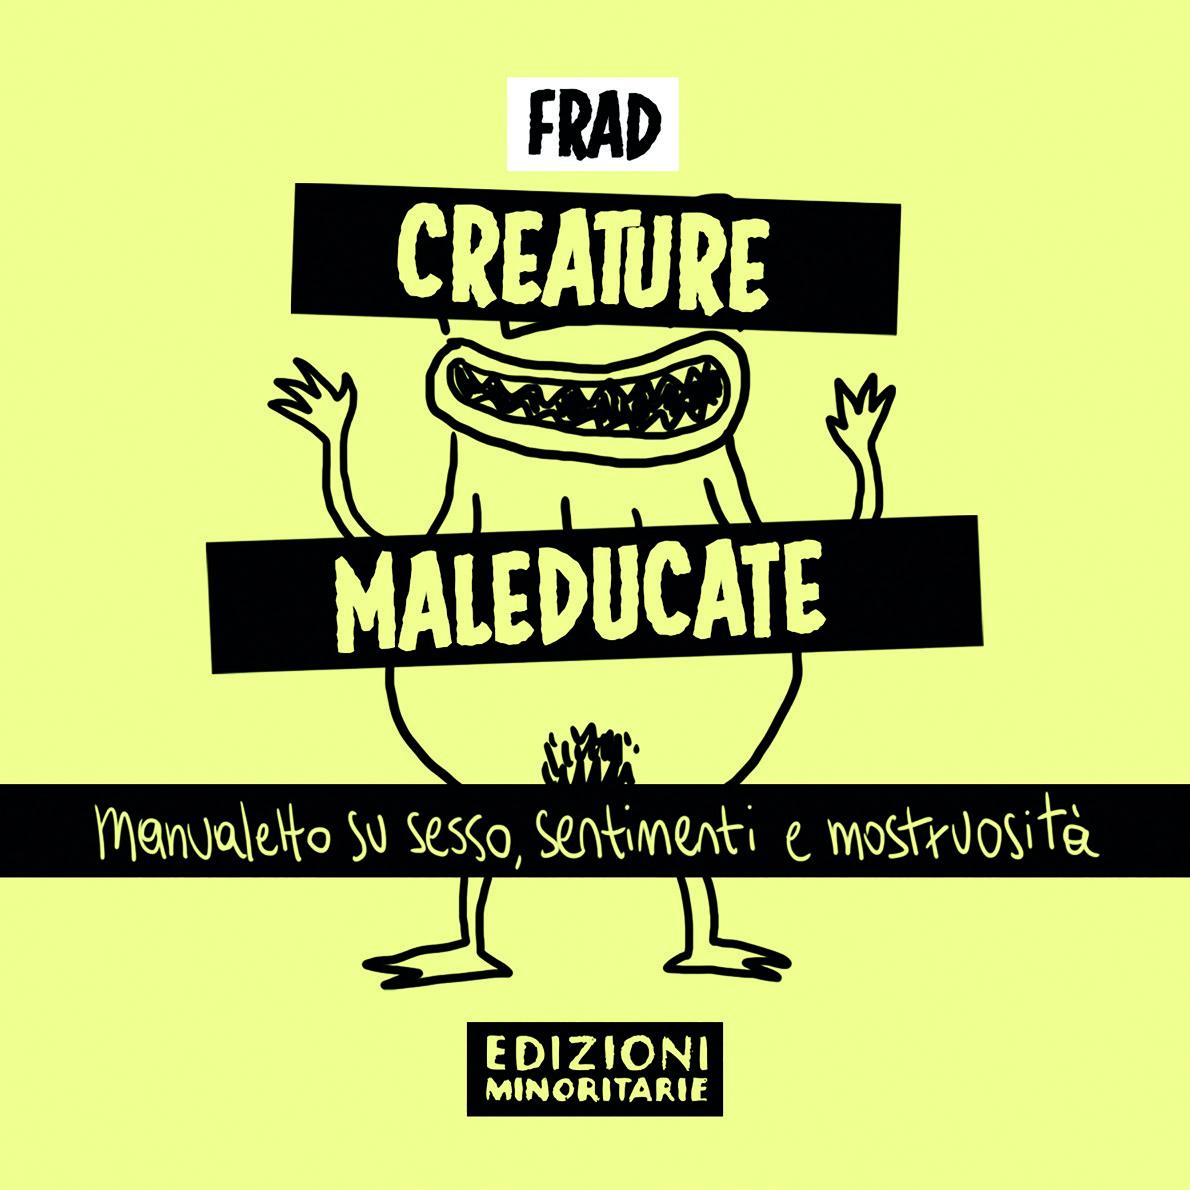 Copertina Creature Maleducate - Credits: PinkNoise.it